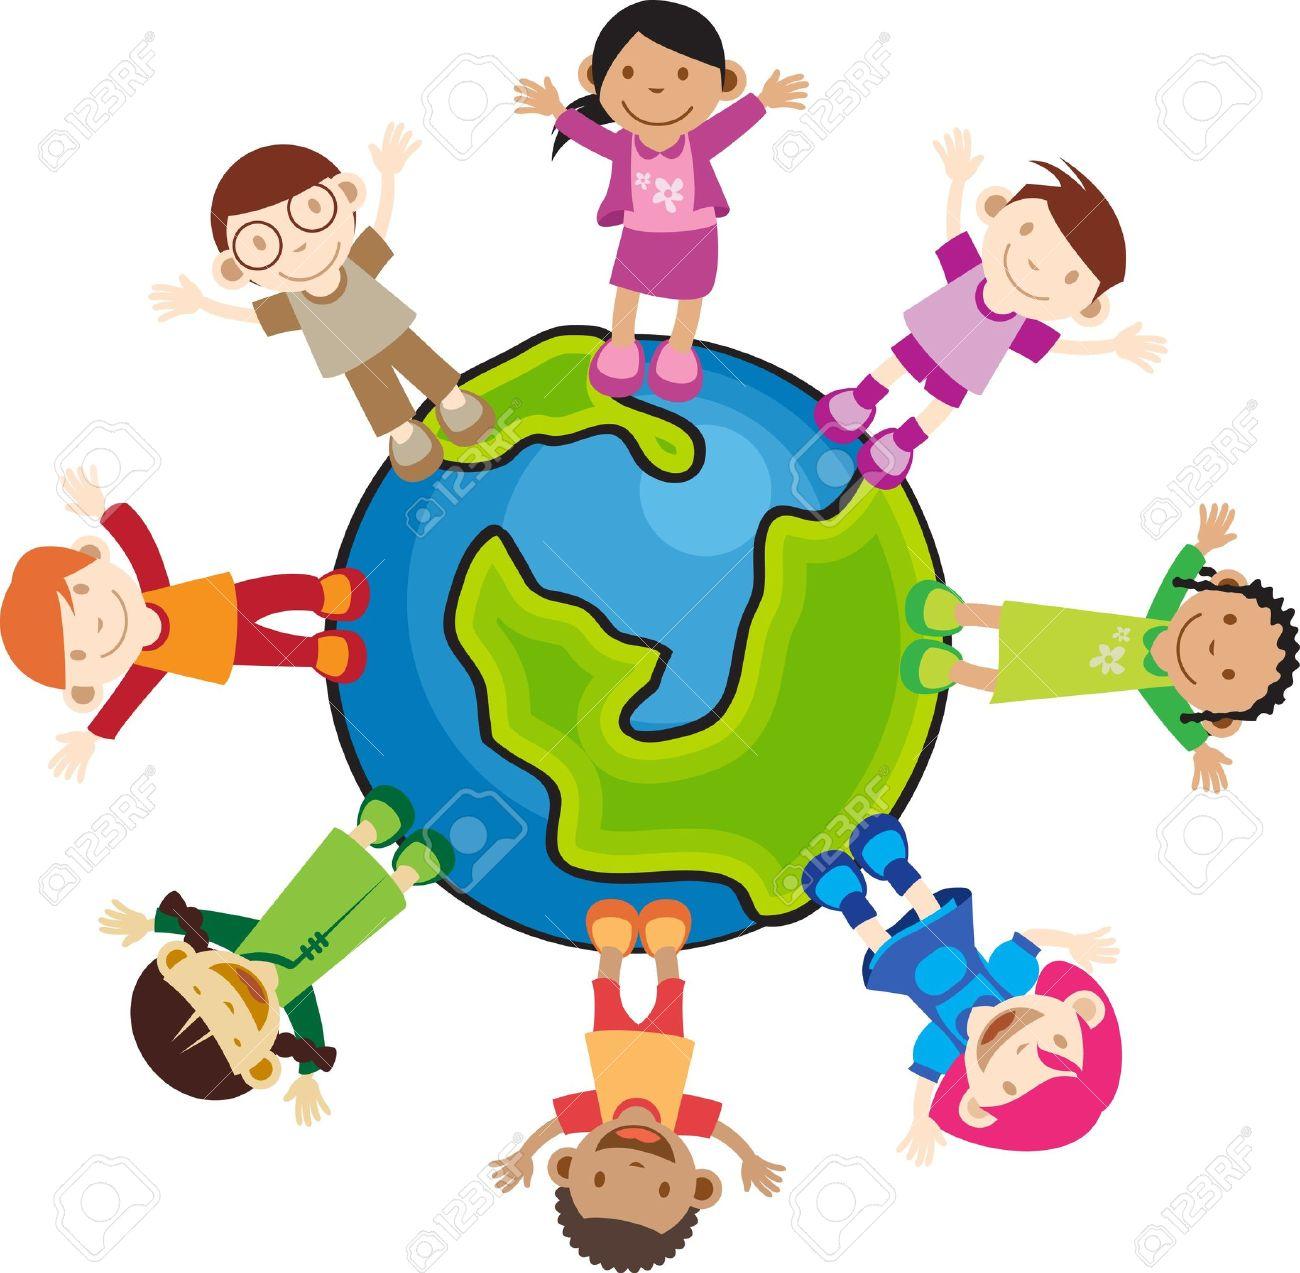 Children raising their hands standing around the world. peaceful. Stock Photo - 4431493